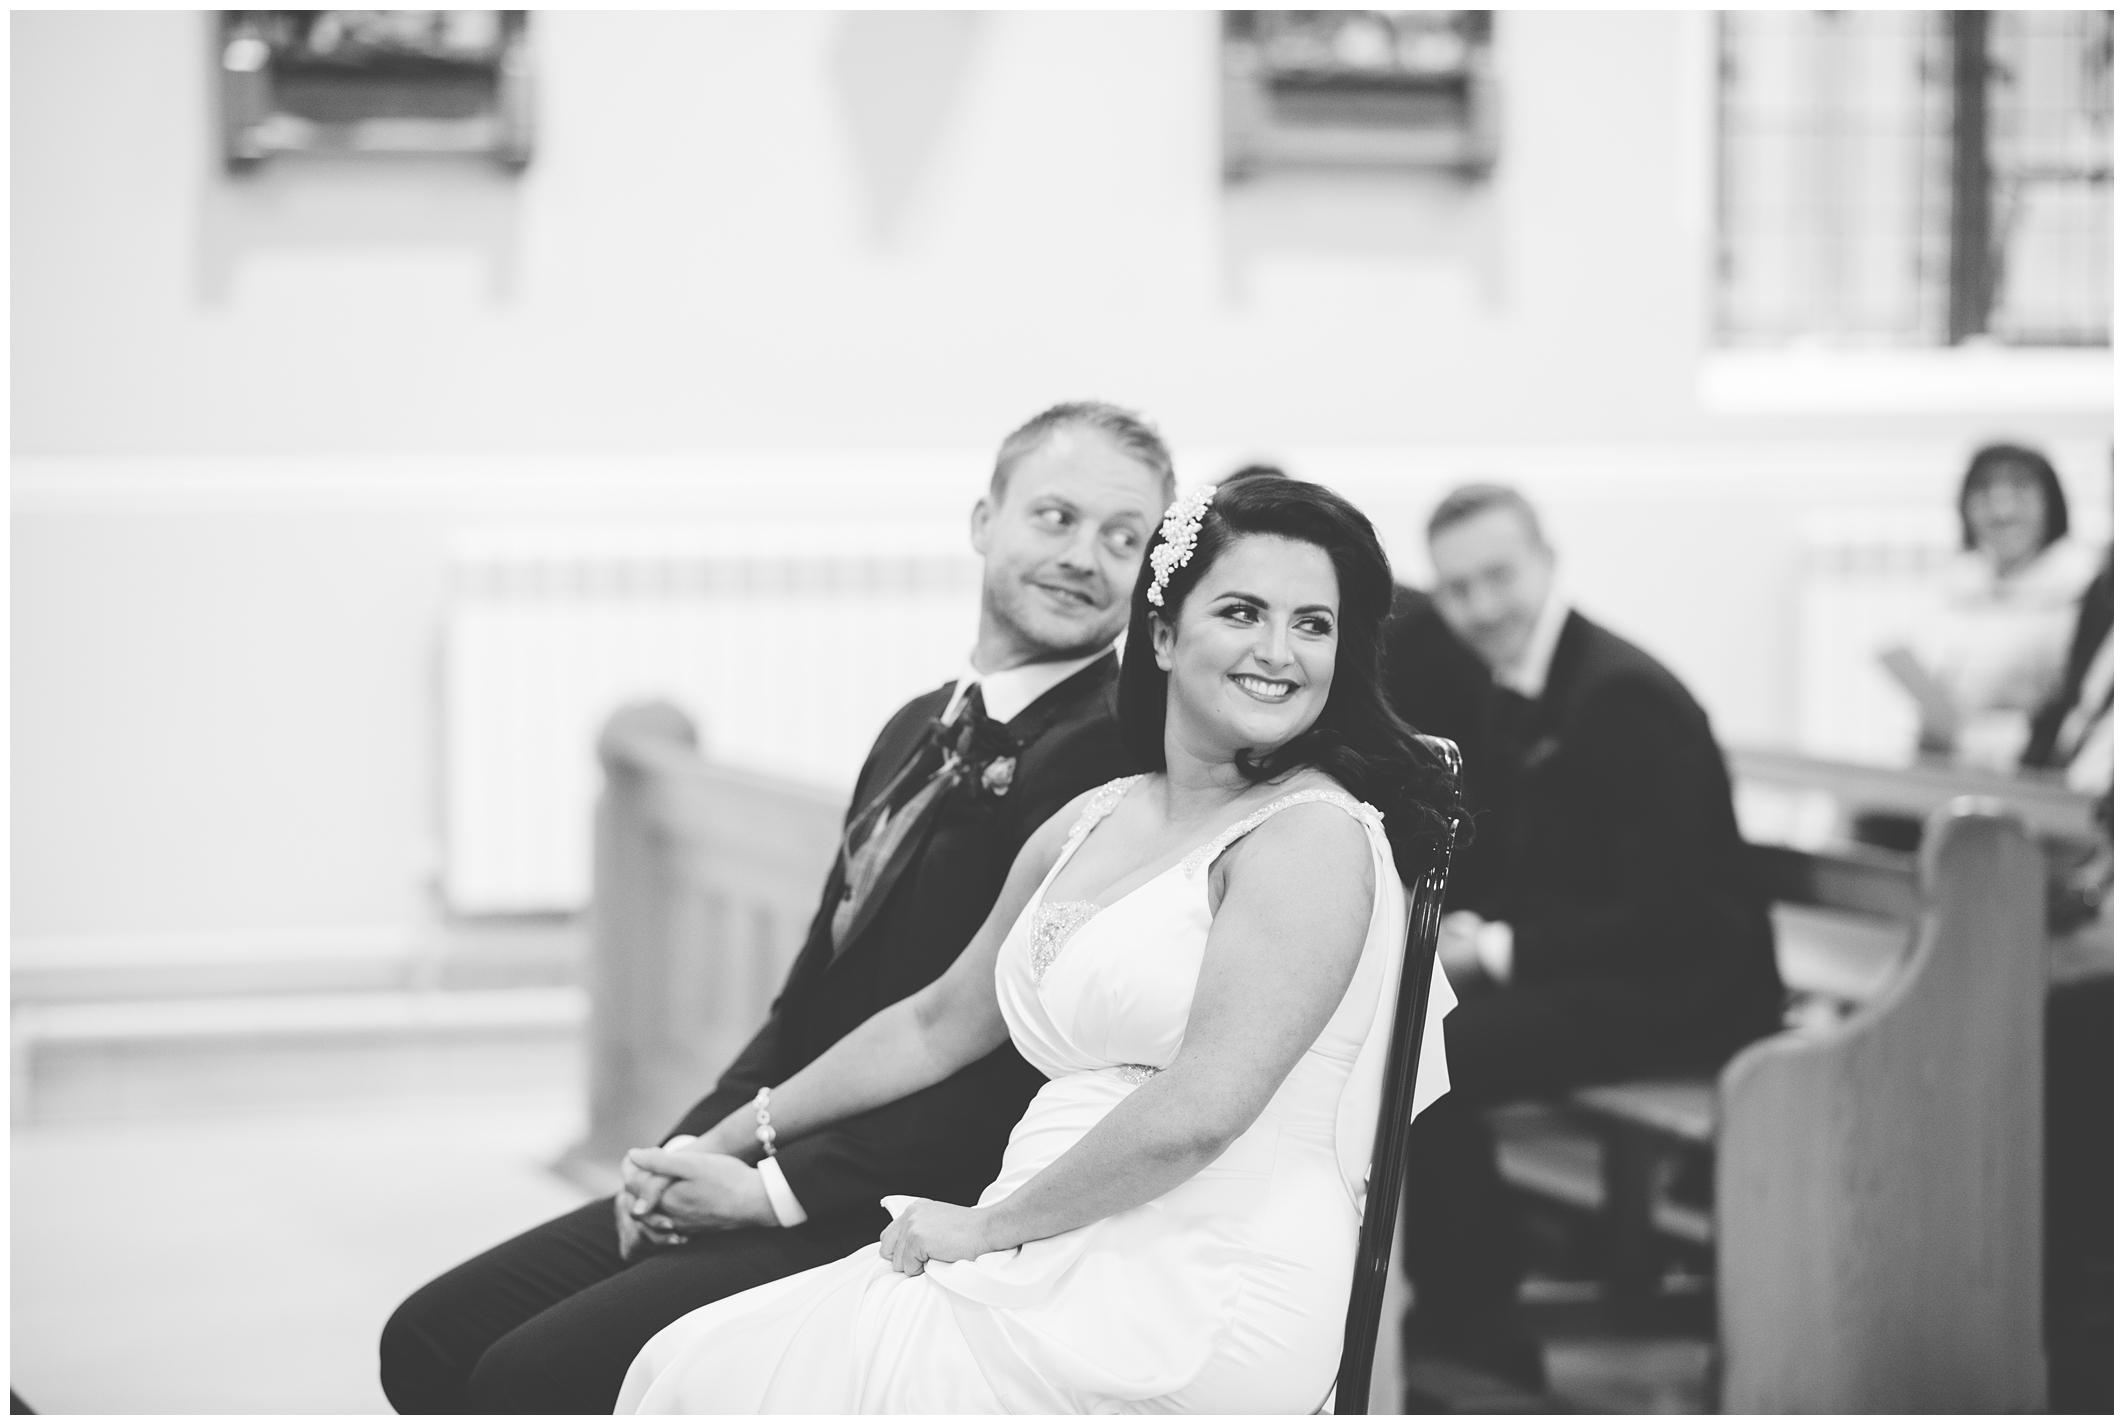 tracey_conor__wedding_jude_browne_photography_0026.jpg